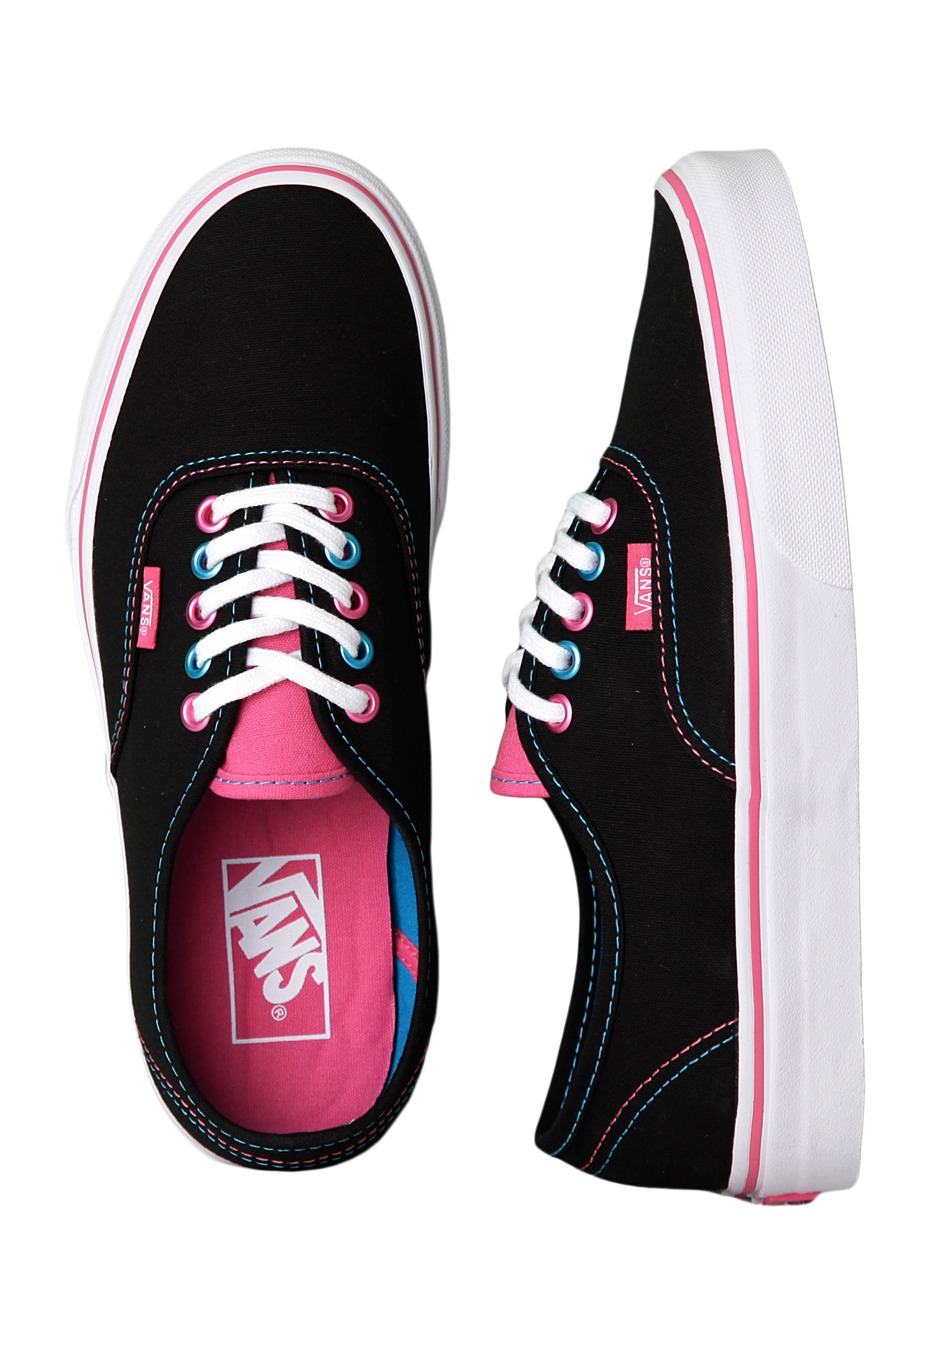 7441278b Vans - Authentic Pop Eyelets Black/Blue Juwel - Girl Shoes